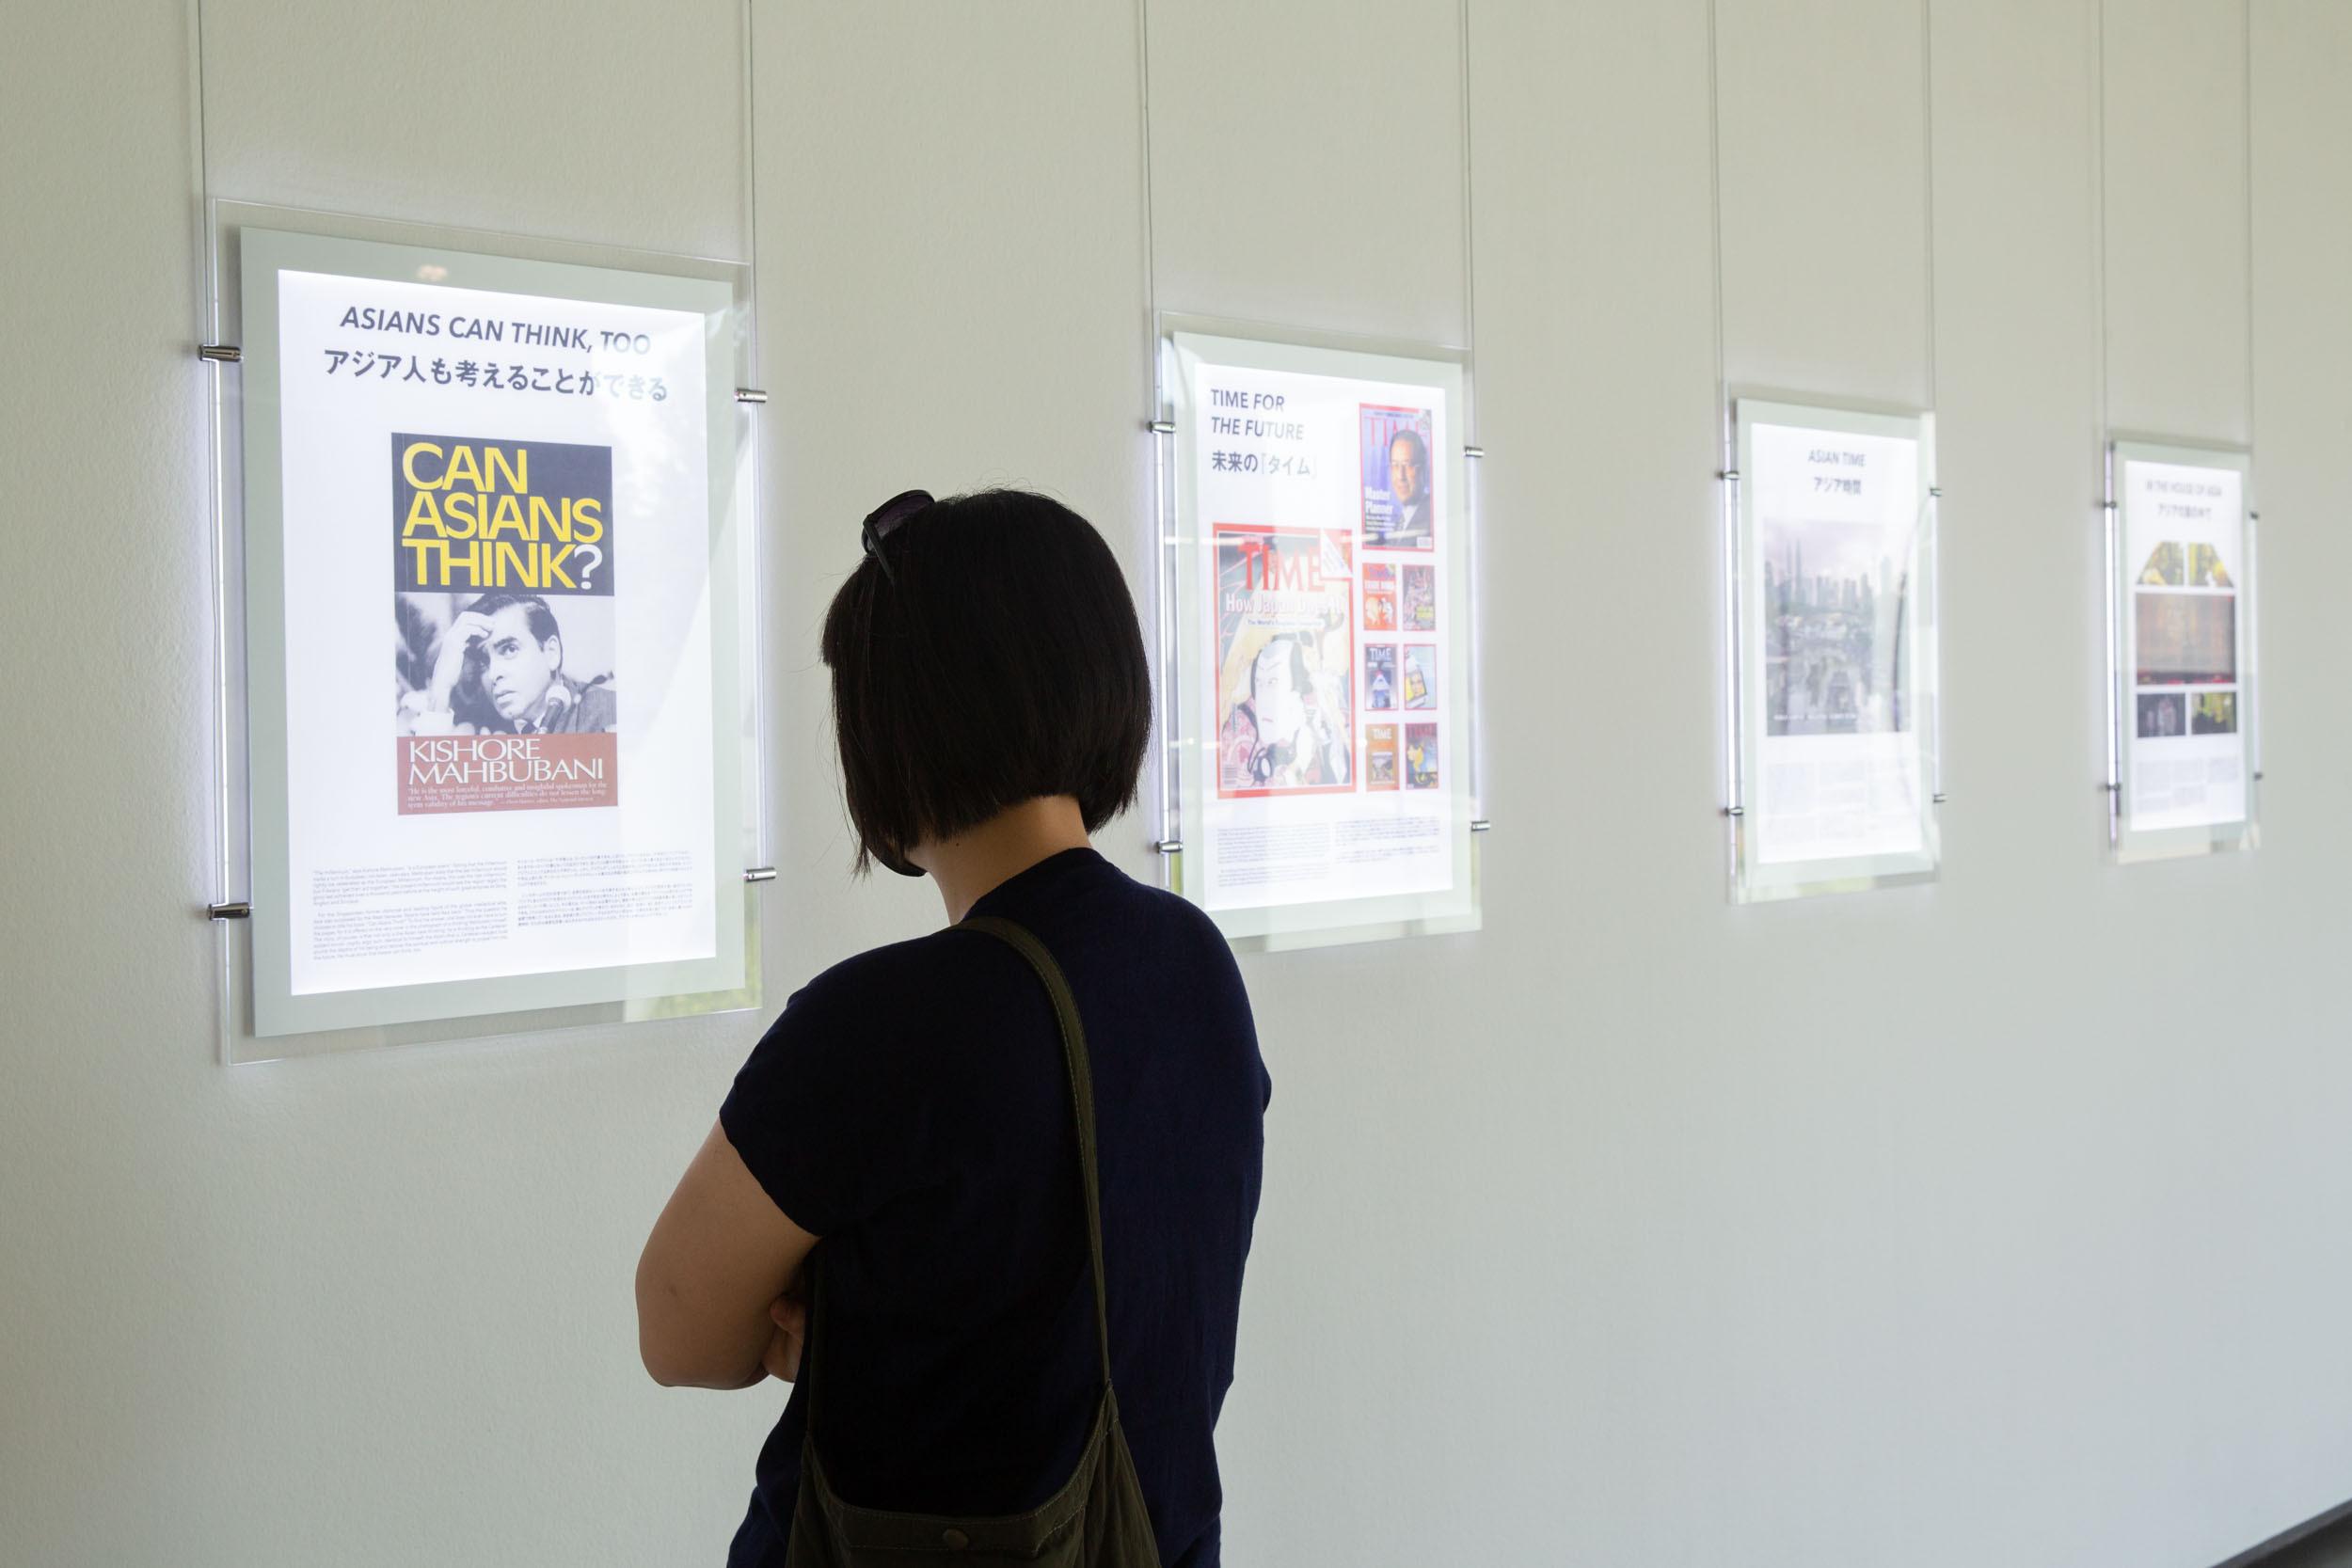 eSeL Foto: Ho Rui An. The Ends of a Long Boom (Kunsthalle Wien Karlsplatz: Eröffnung, 17.7.-10.10.2021)